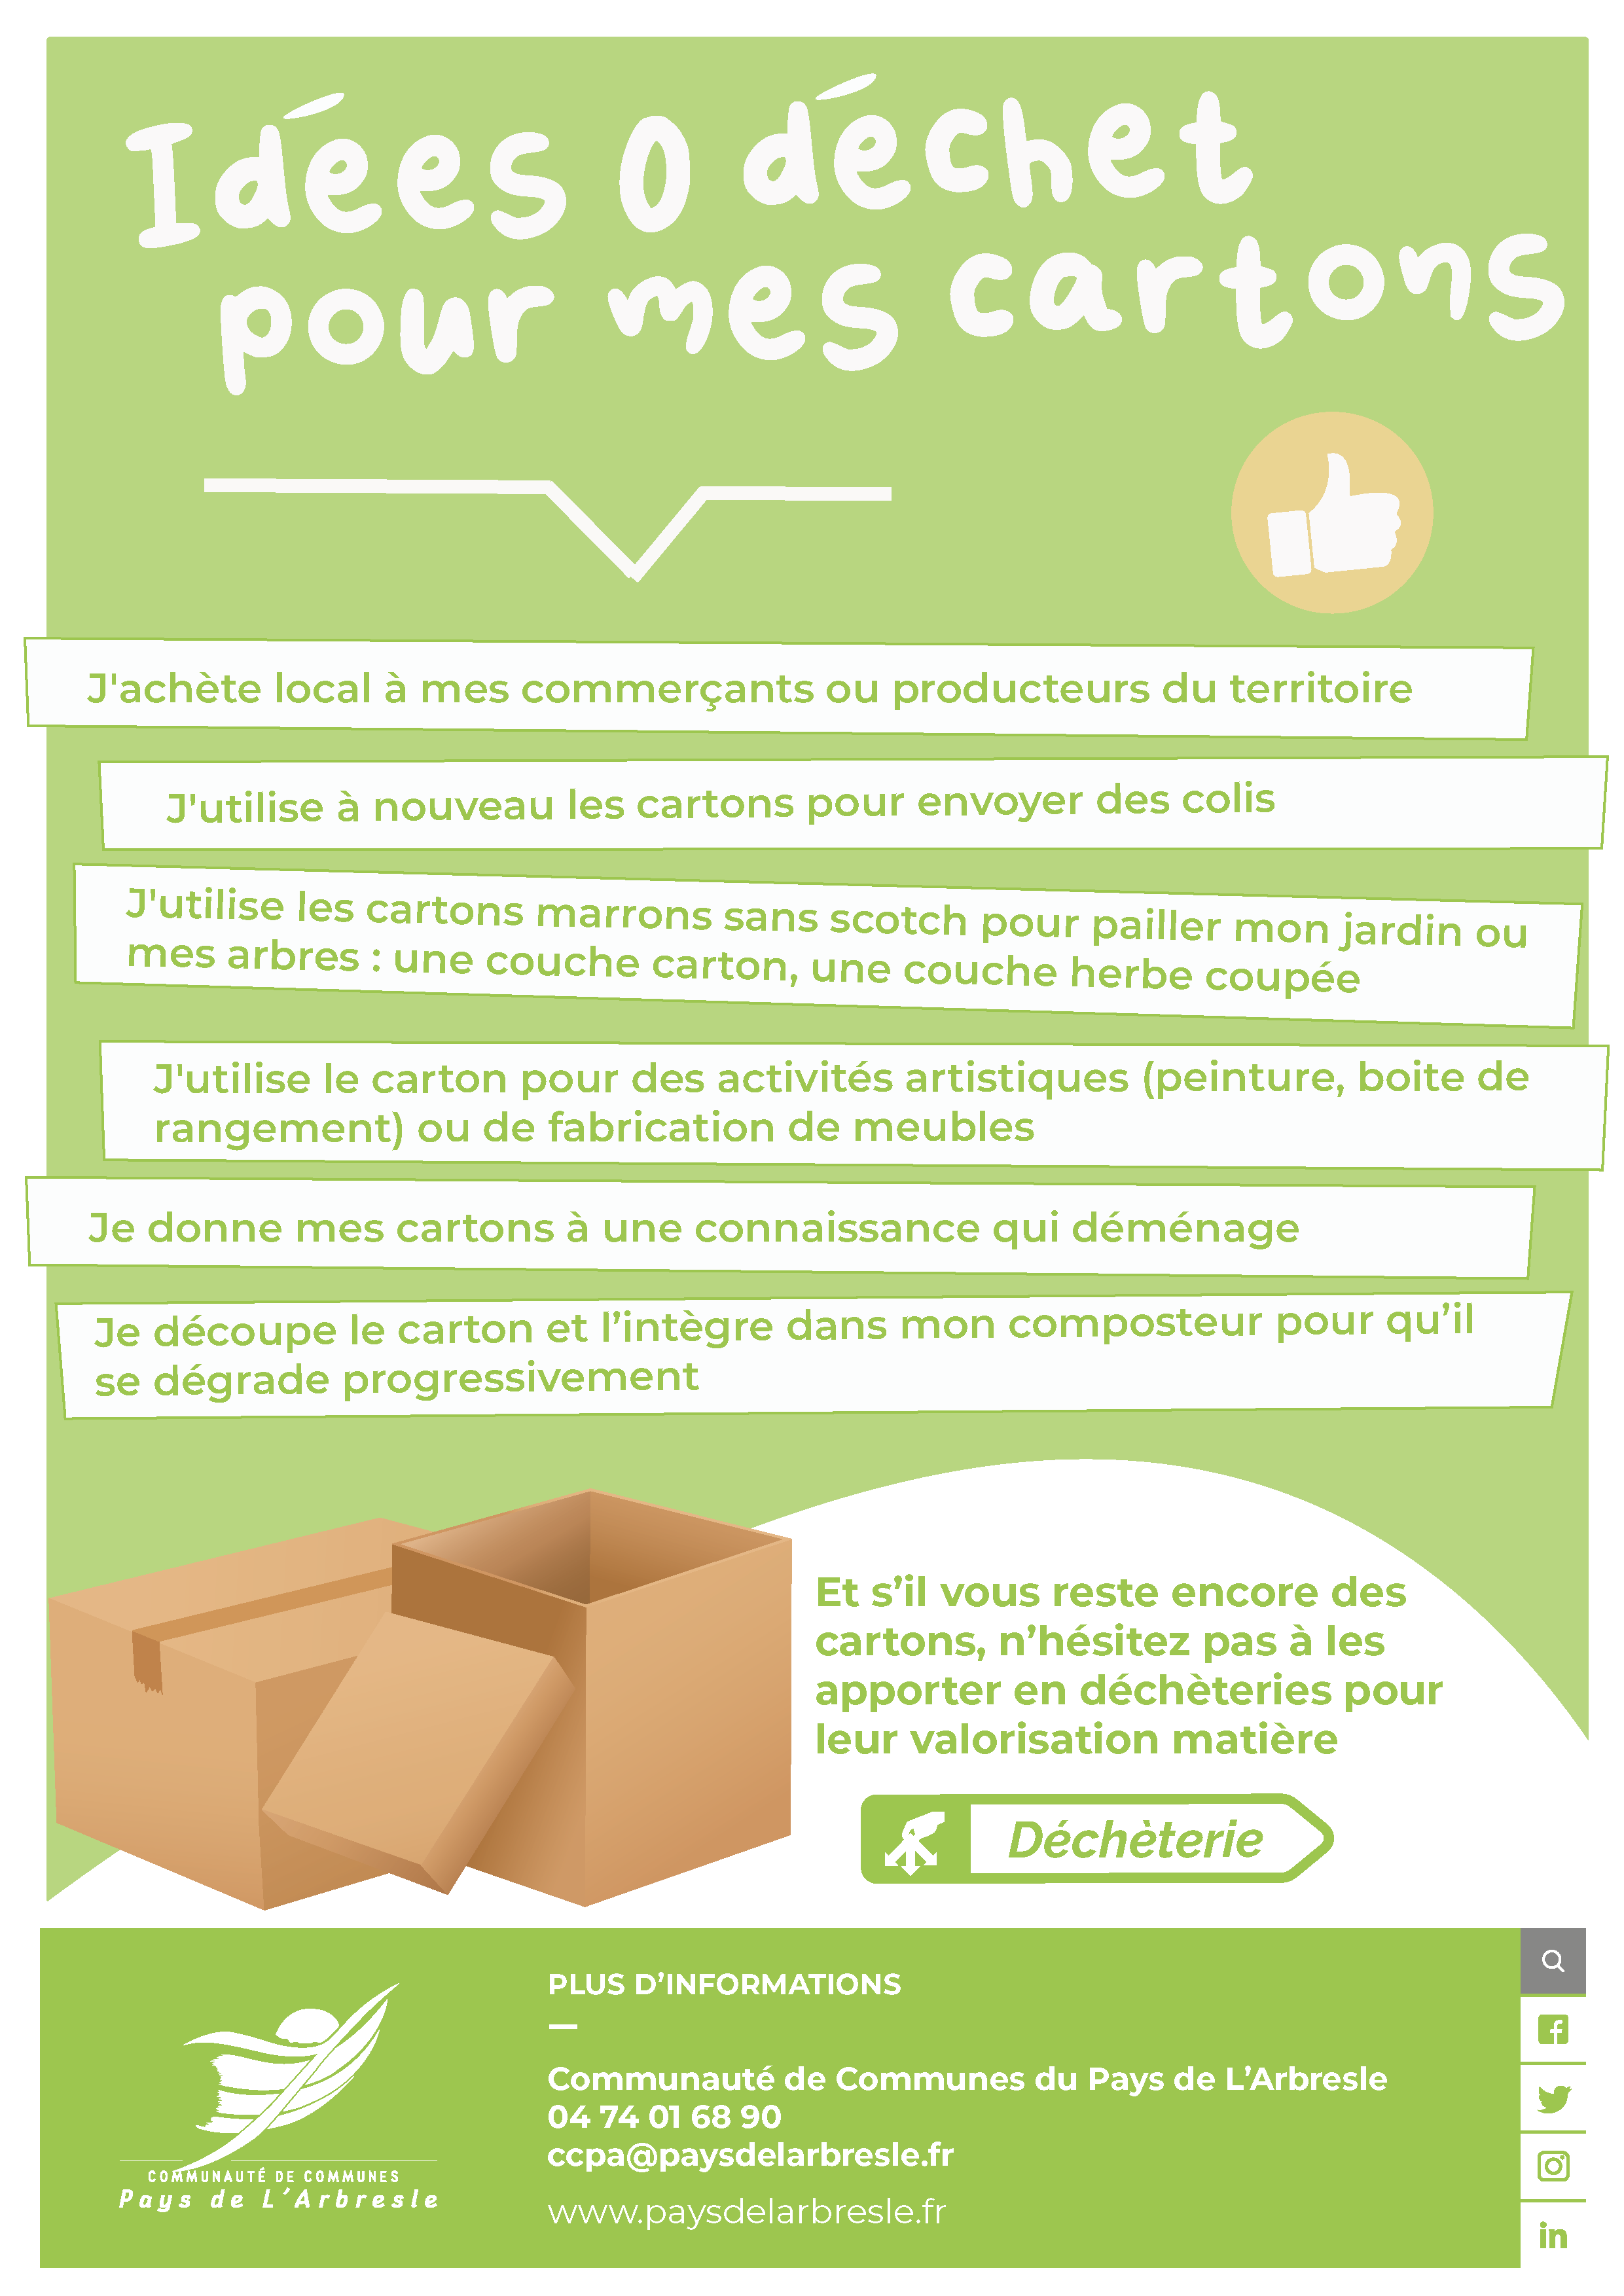 tri-carton-conseils.png